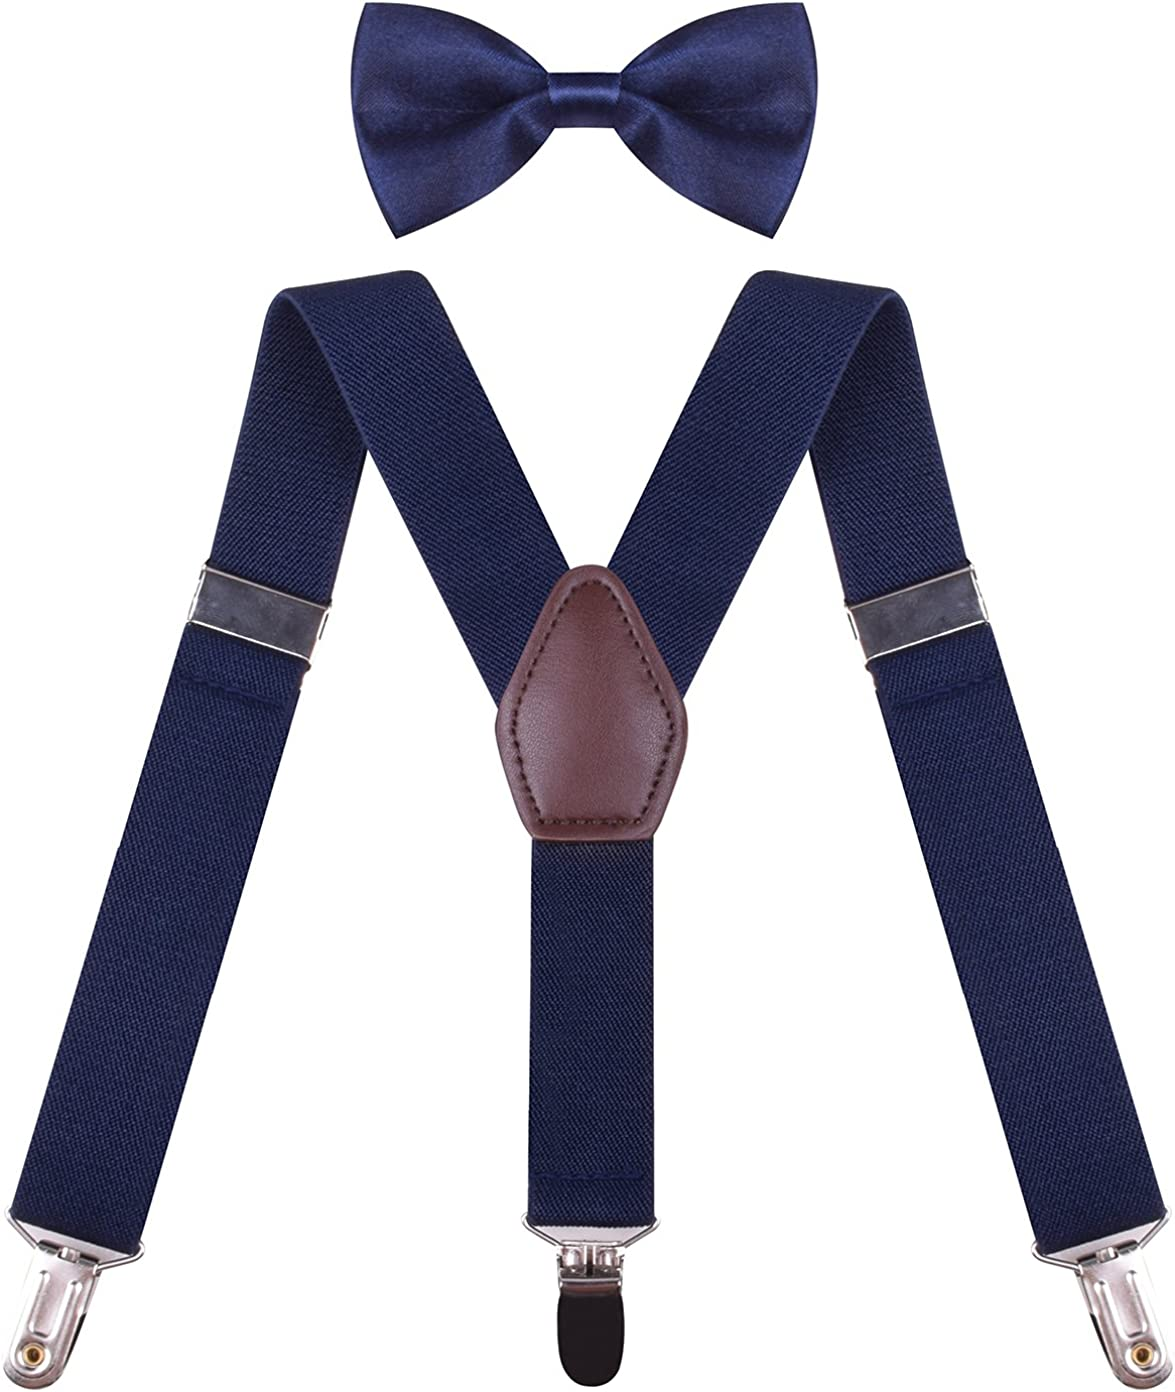 ORSKY Boys' Suspenders with Bow Tie Set Adjustable Y Back